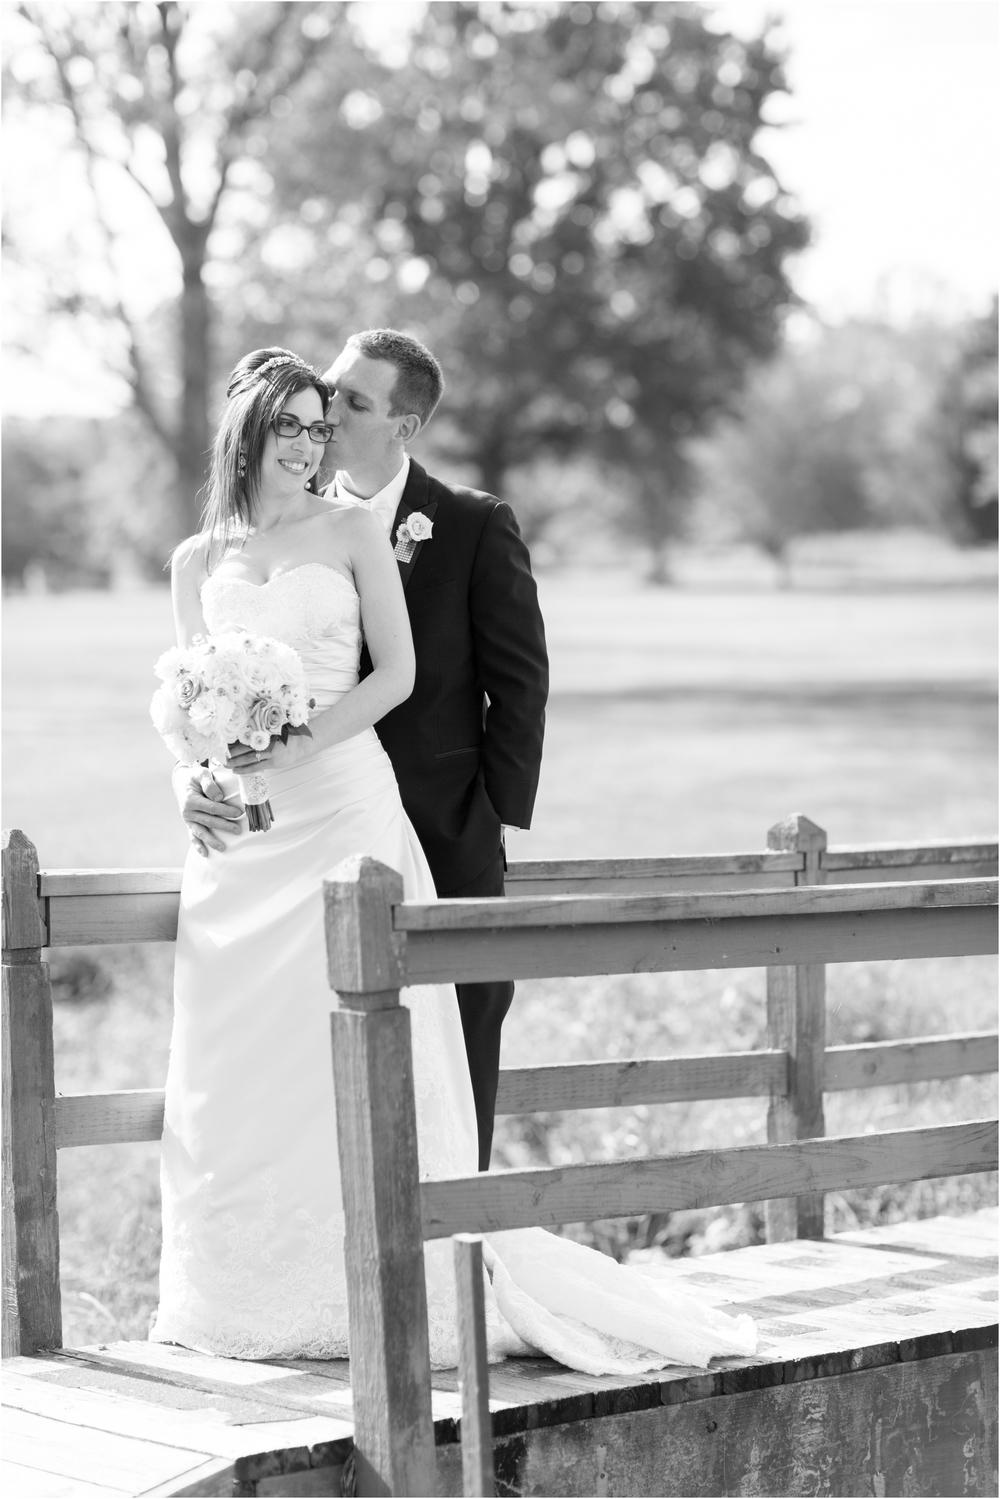 Elhai-Wedding-3-Bride-and-Groom-610.jpg